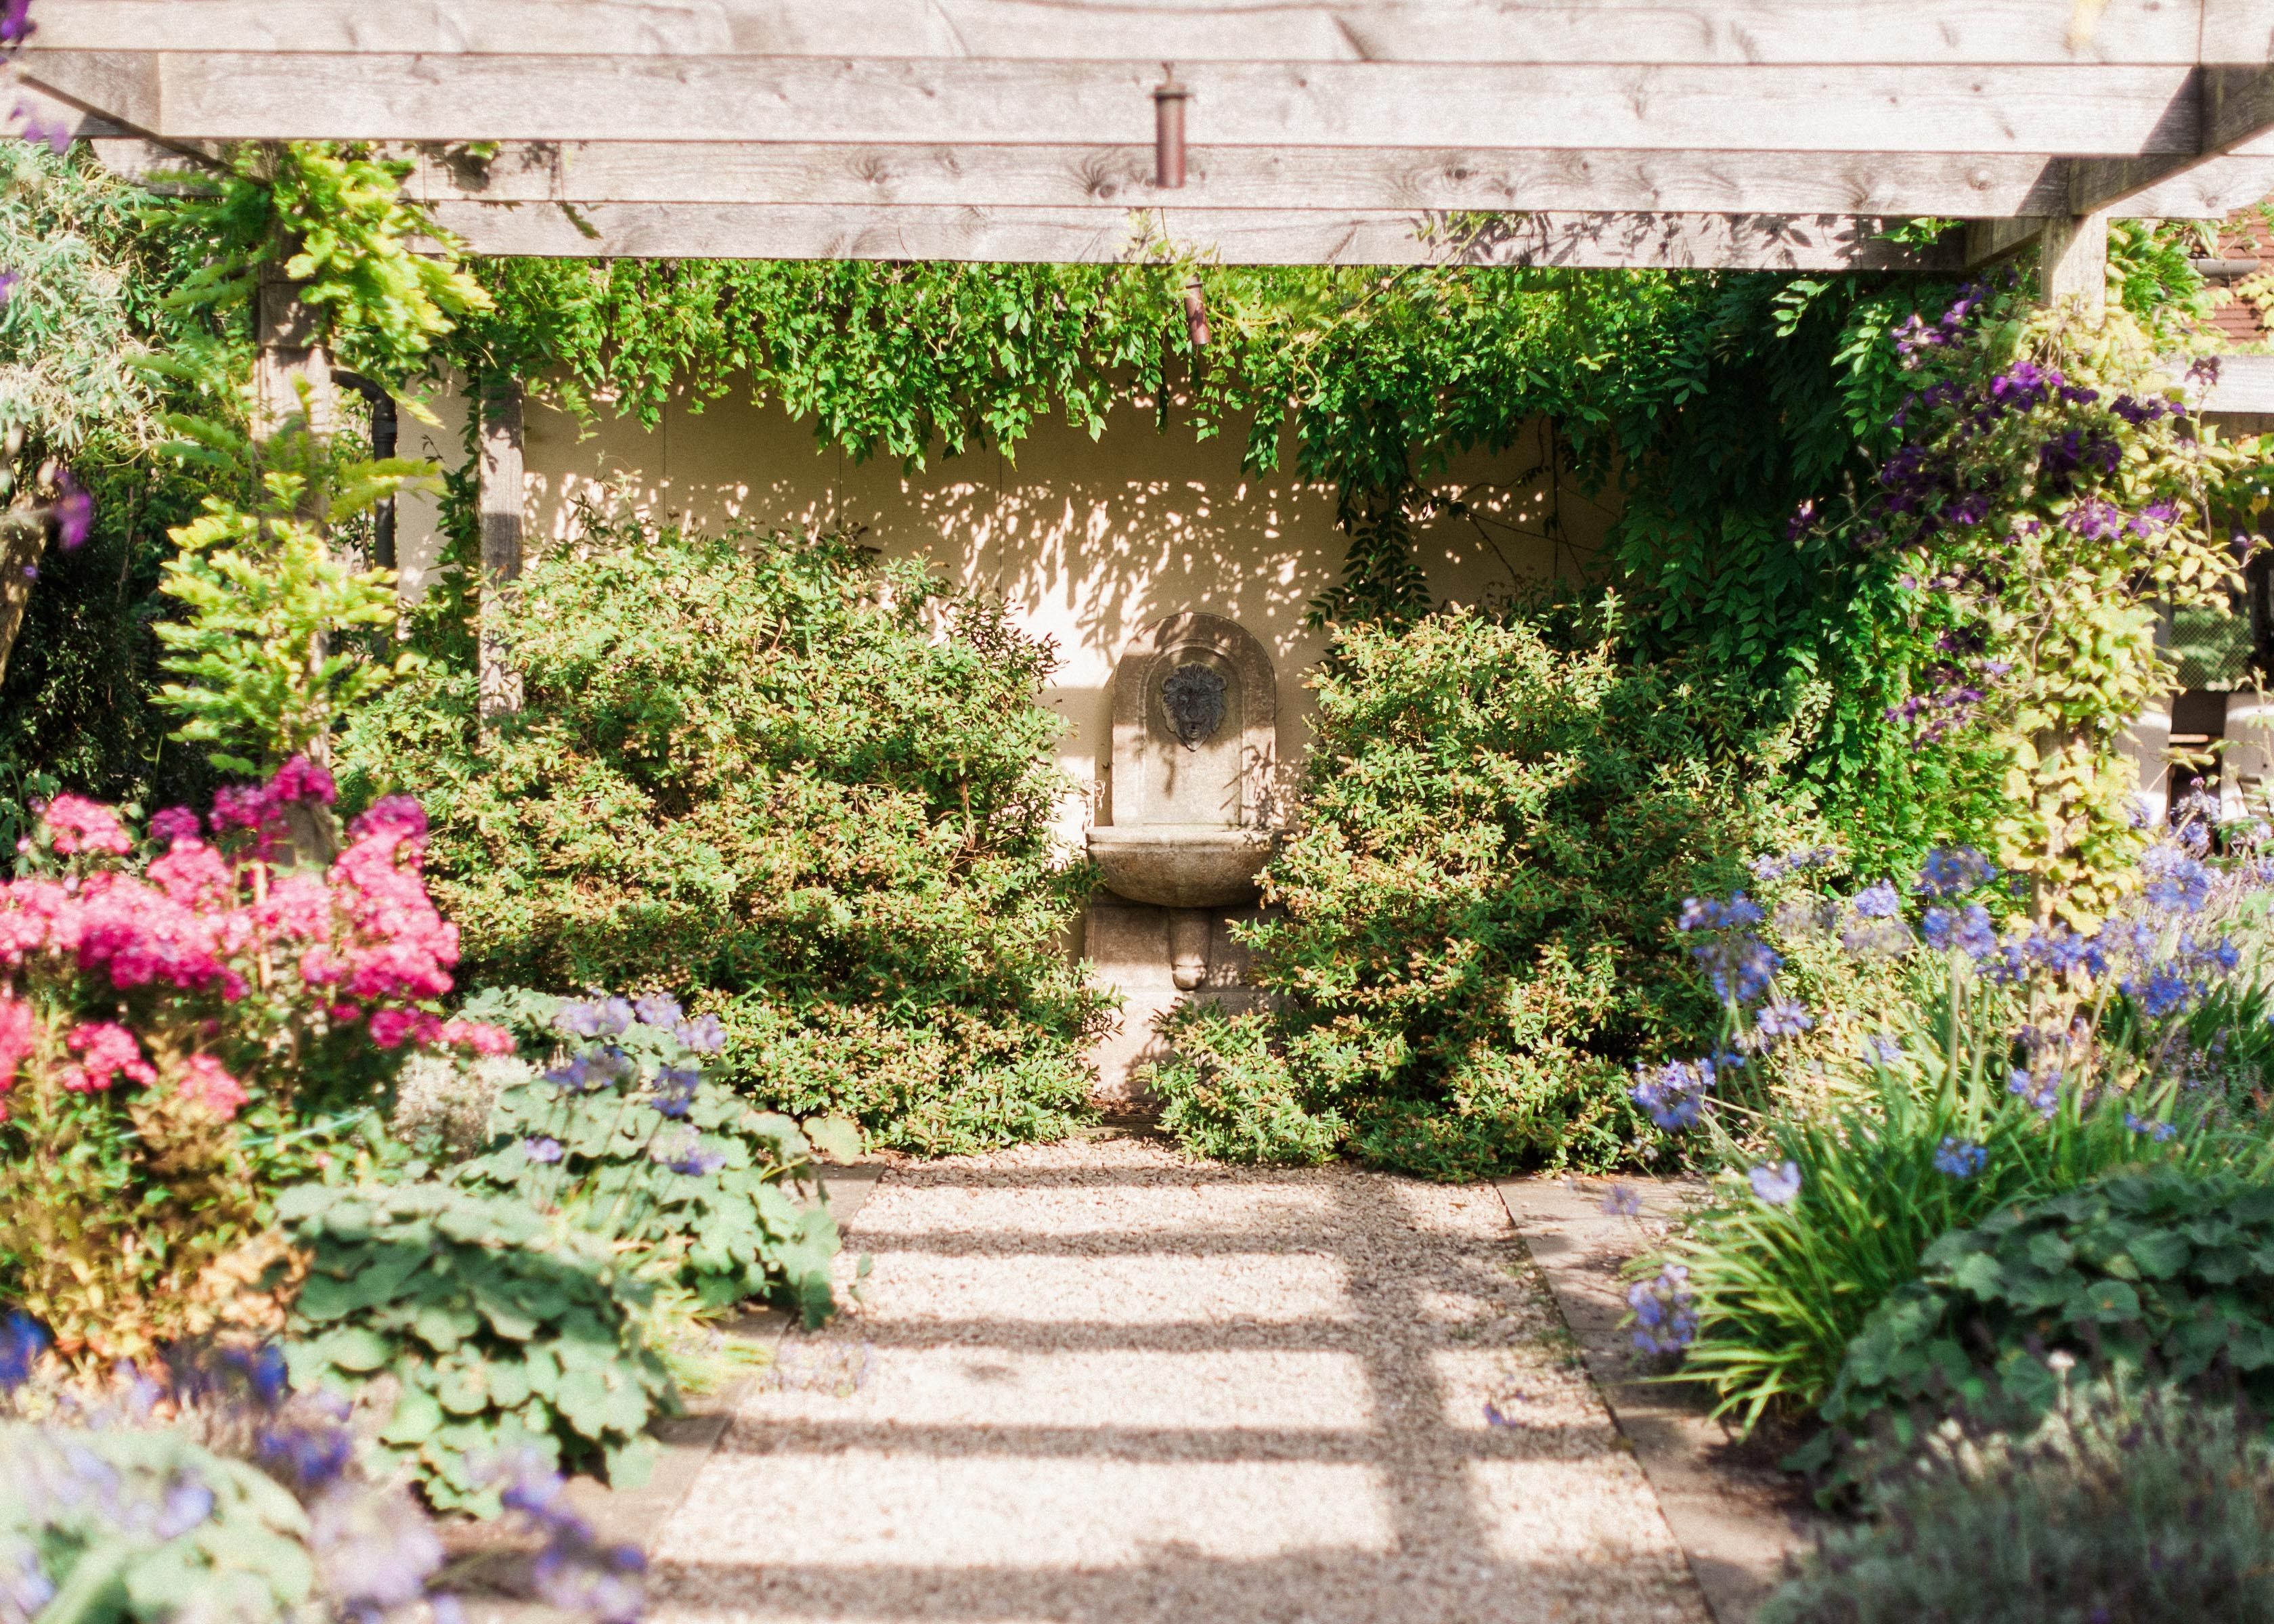 Wickham Picture Gardens - Garden Ftempo